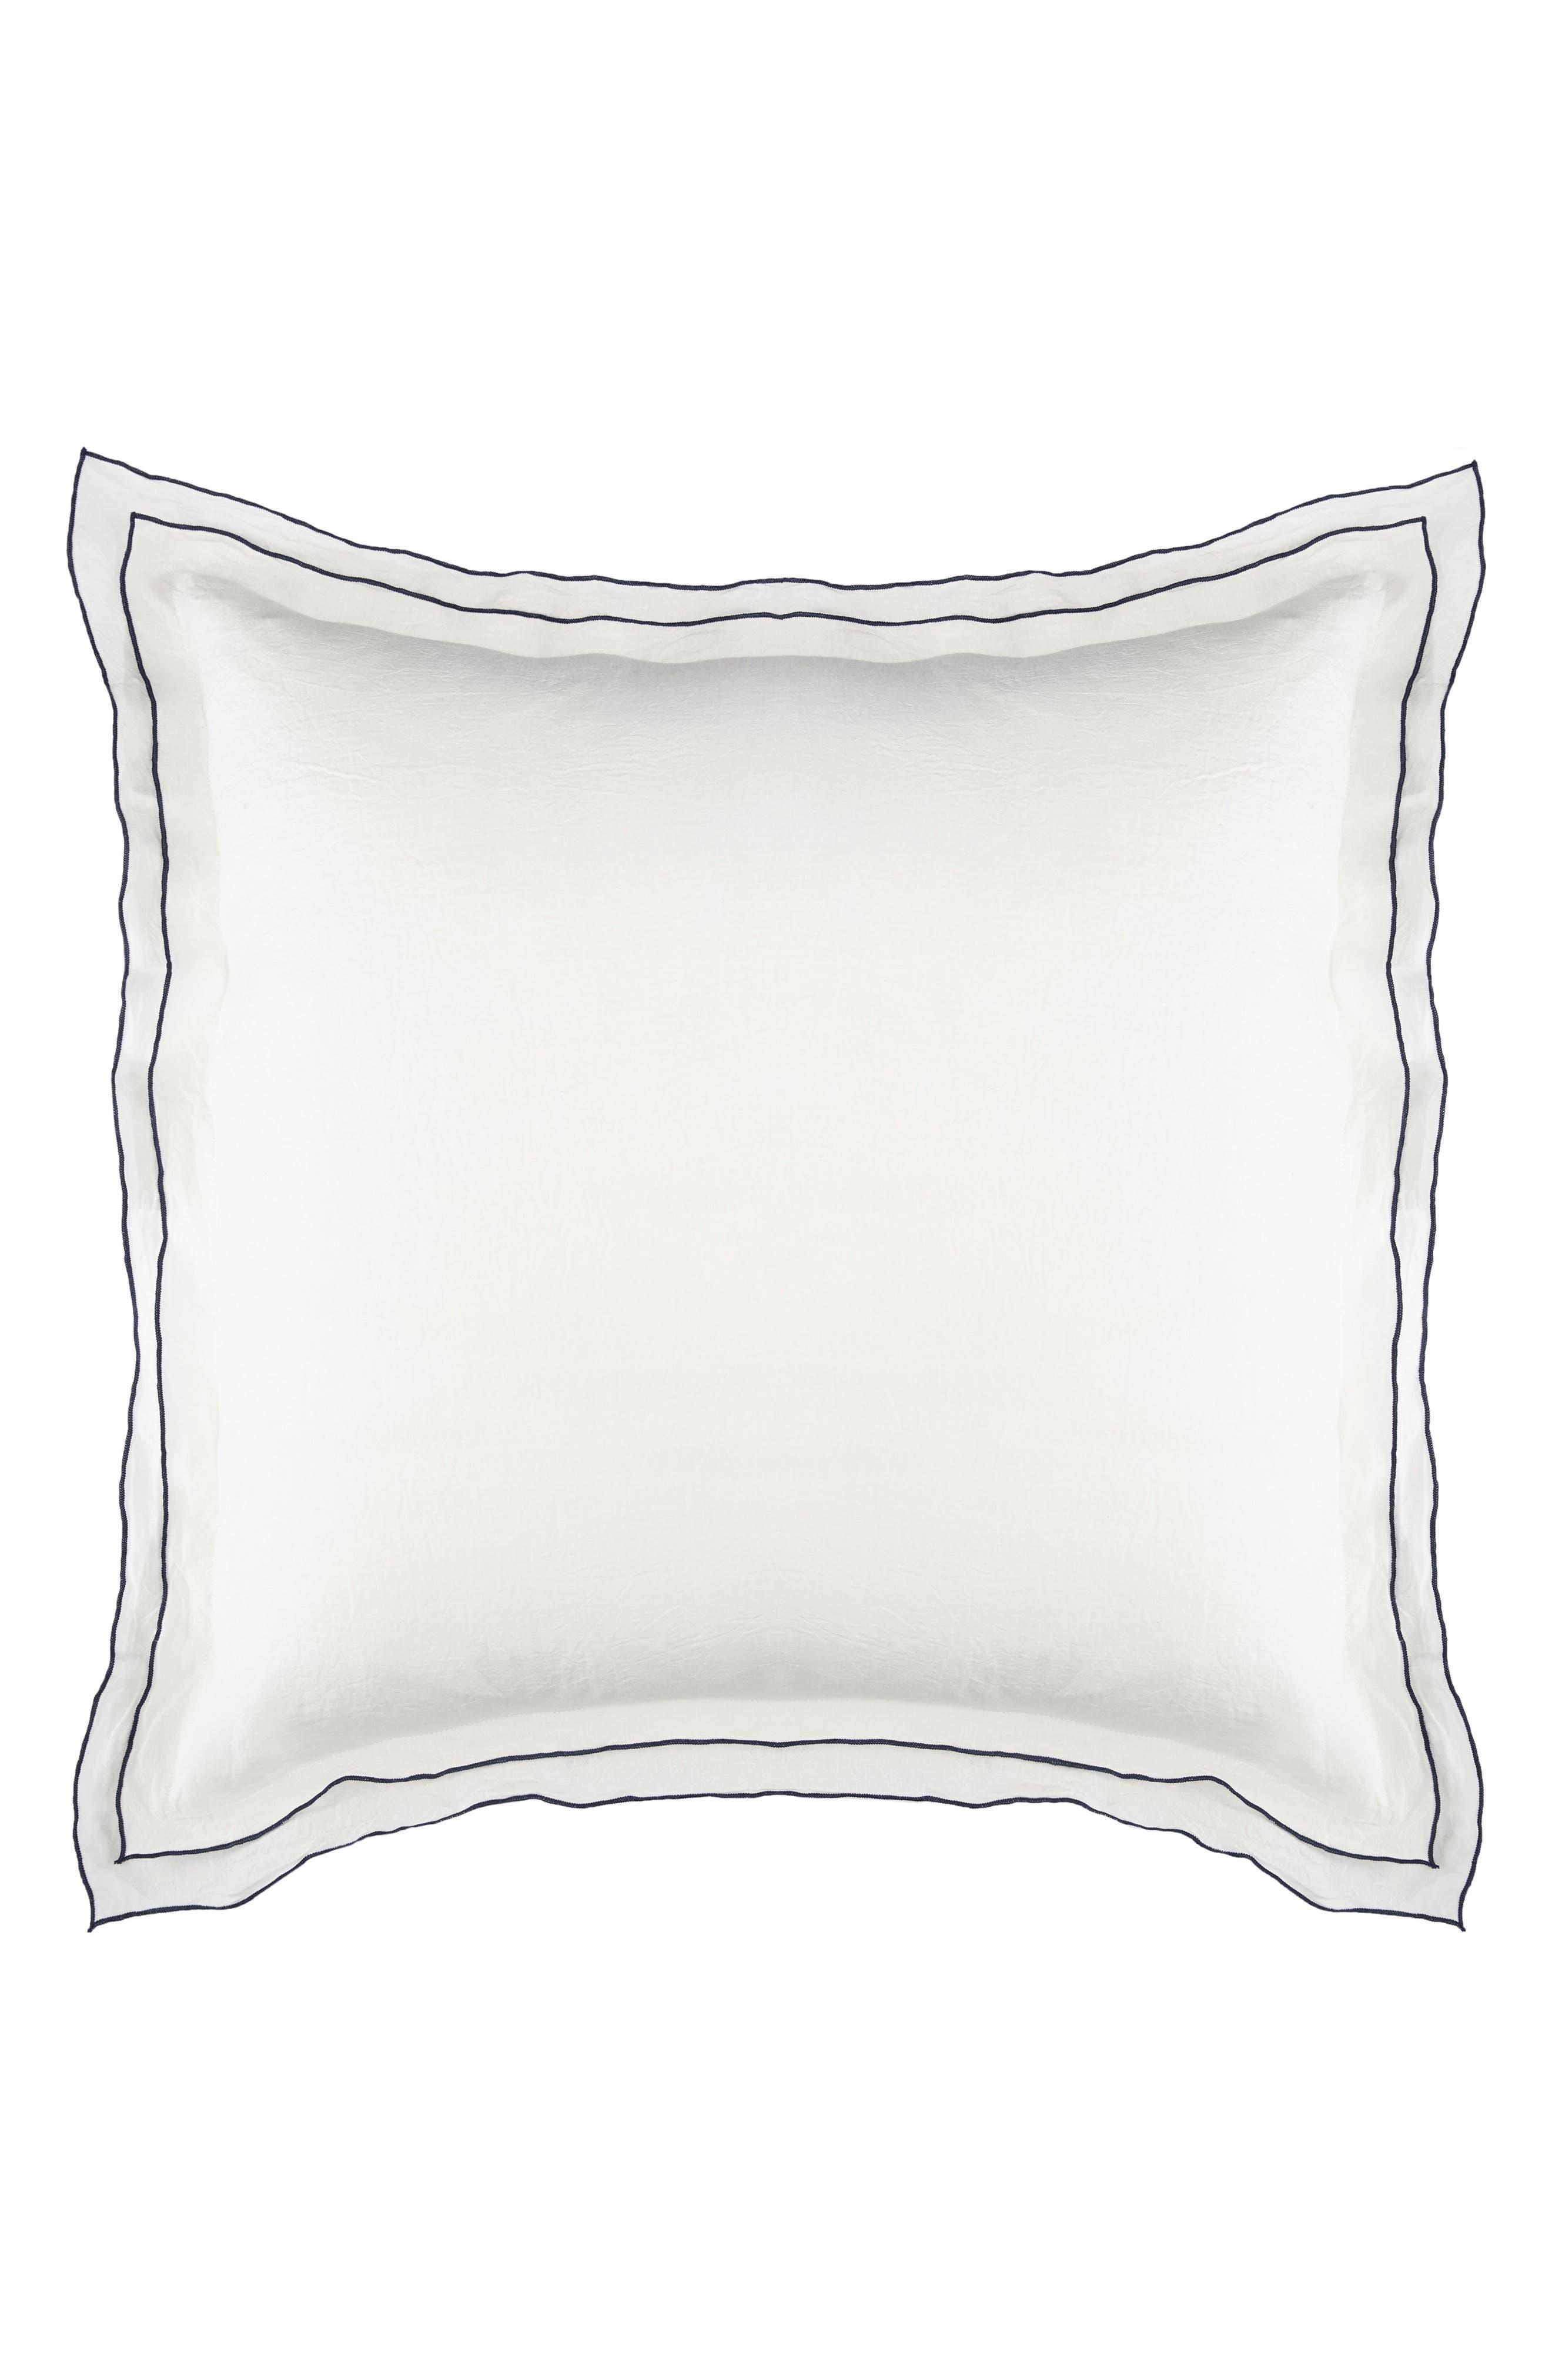 Biarritz Linen Euro Sham,                         Main,                         color, White/ Indigo